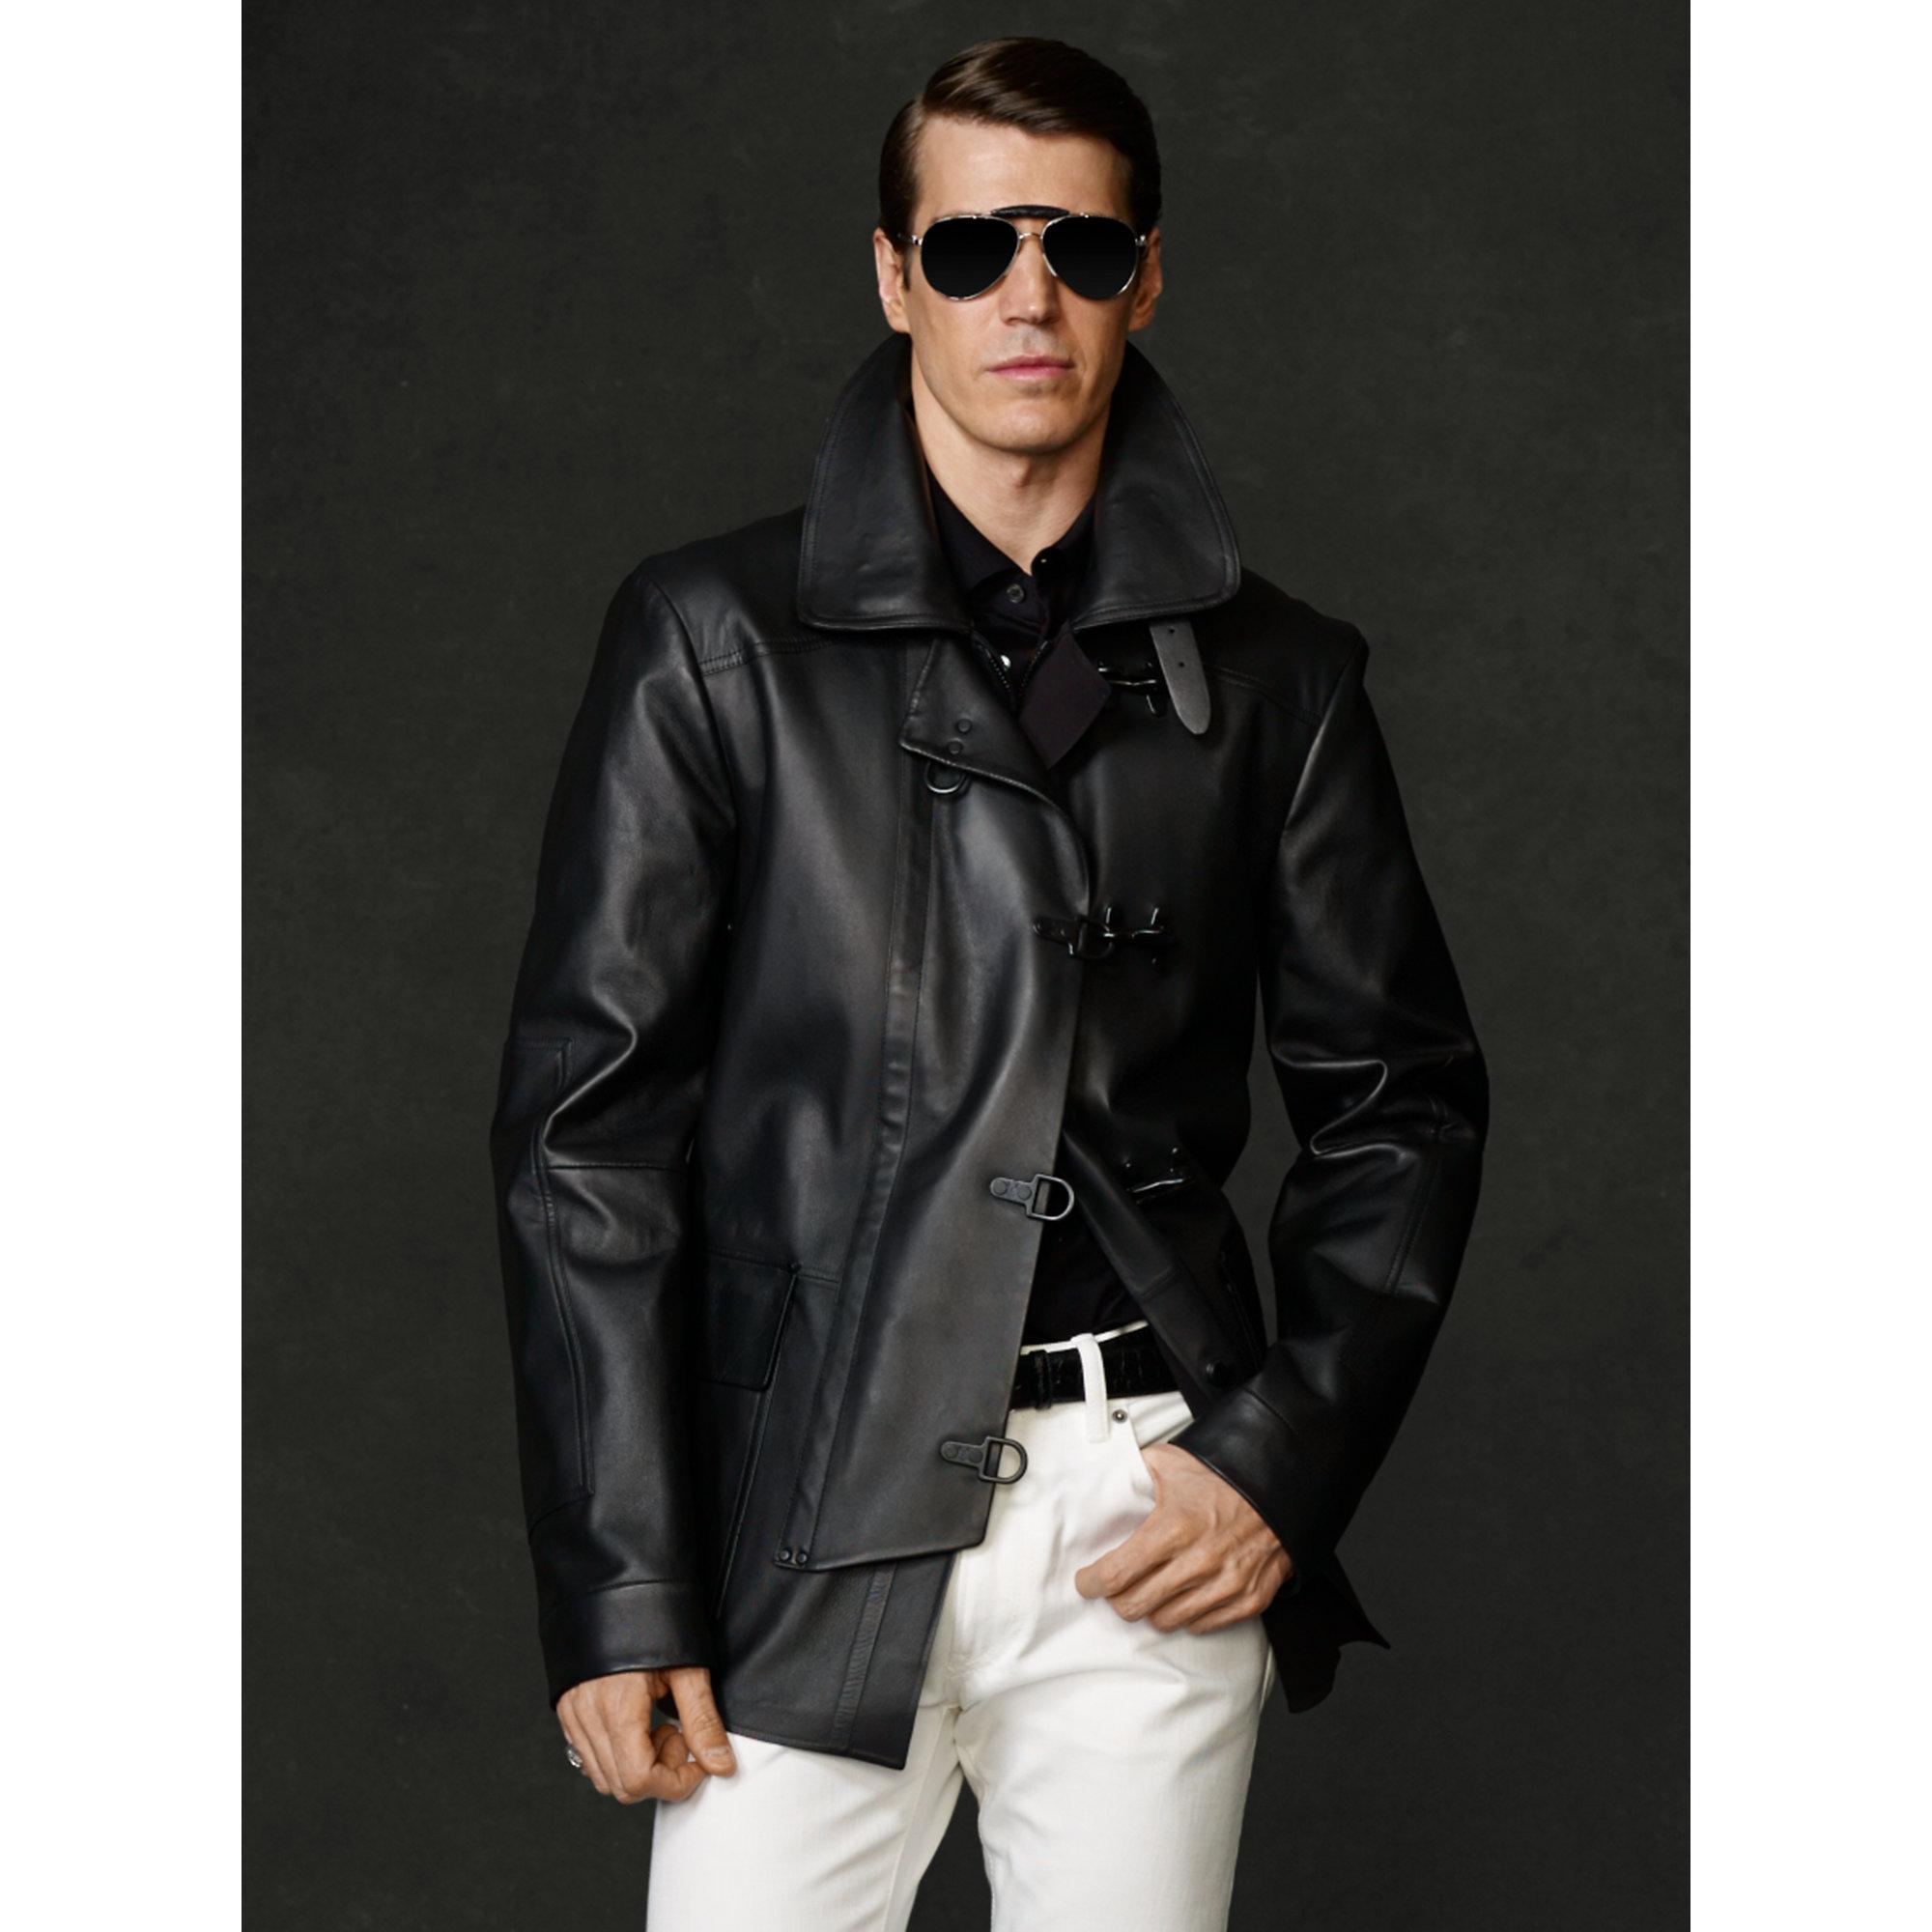 Ralph Lauren Purple Label Leather Rescue Jacket In Black